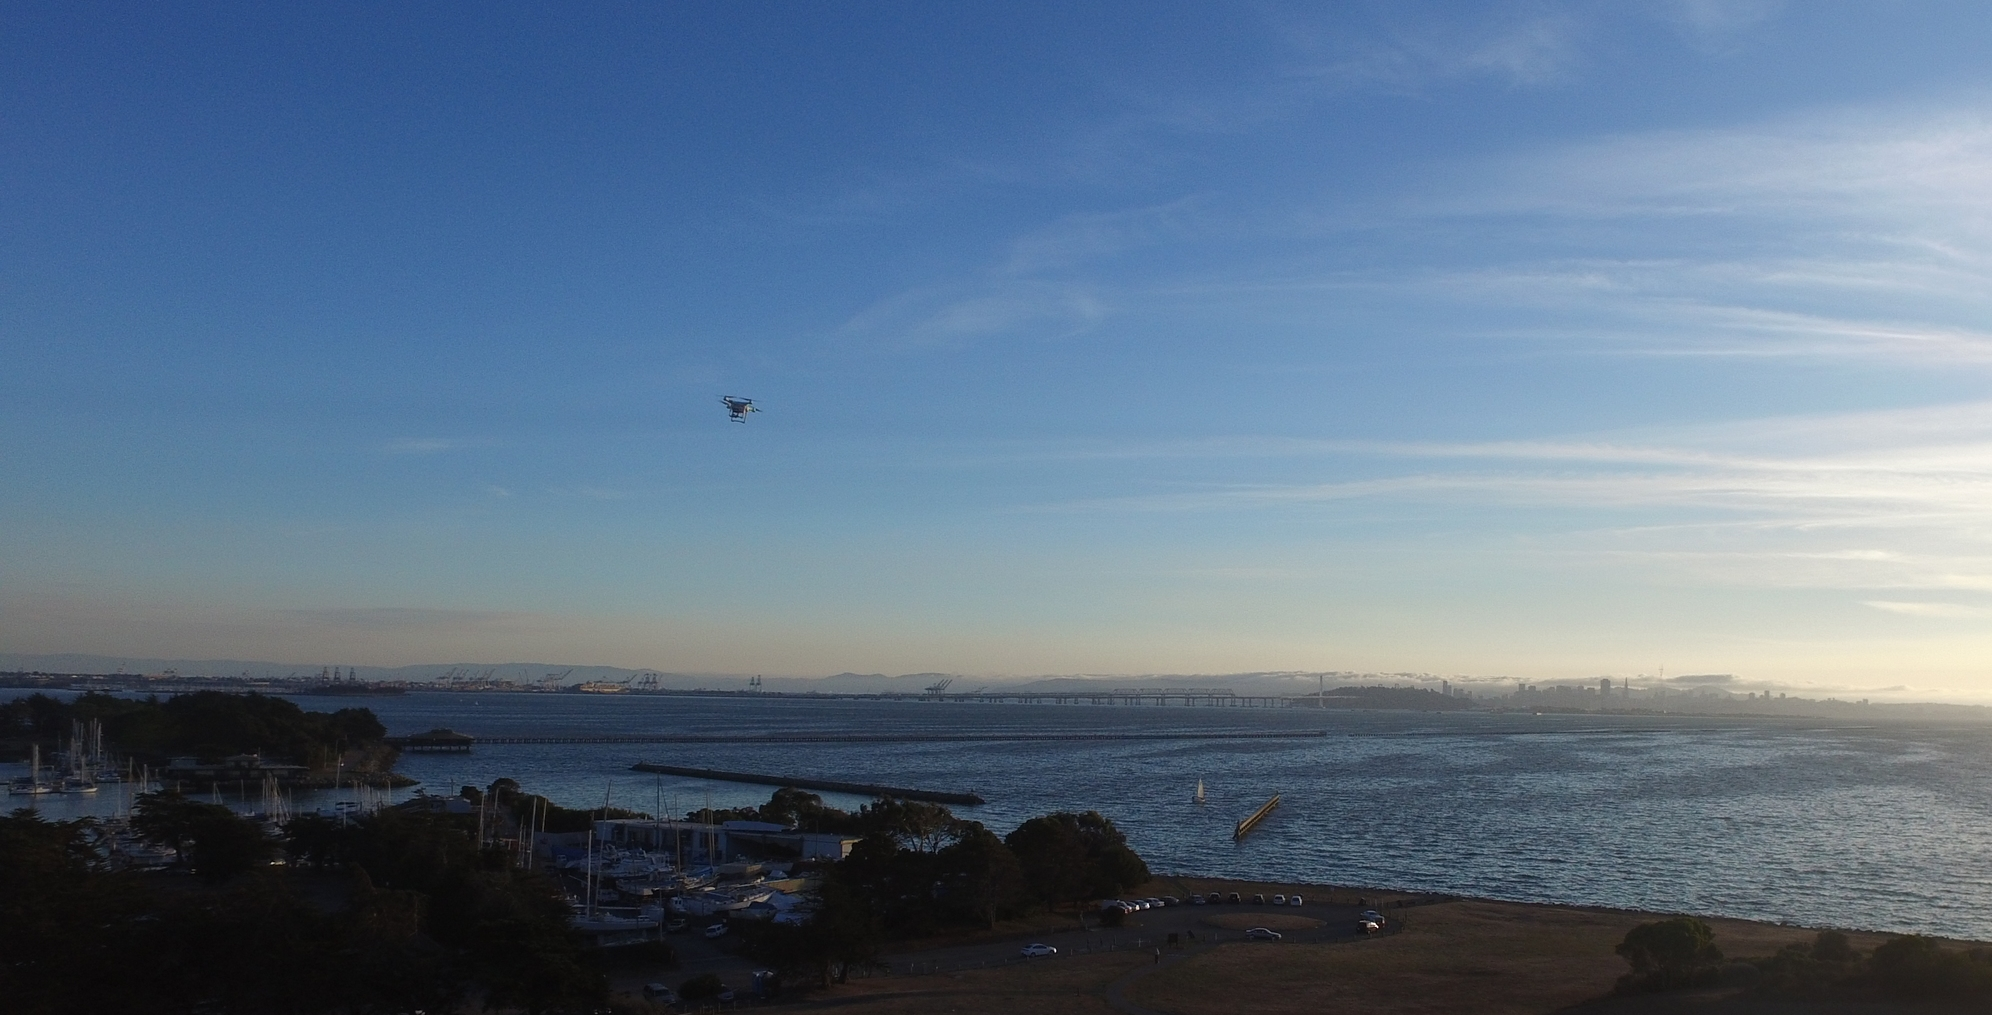 An Unregistered DJI Phantom flies over Oakland, CA on October 16th